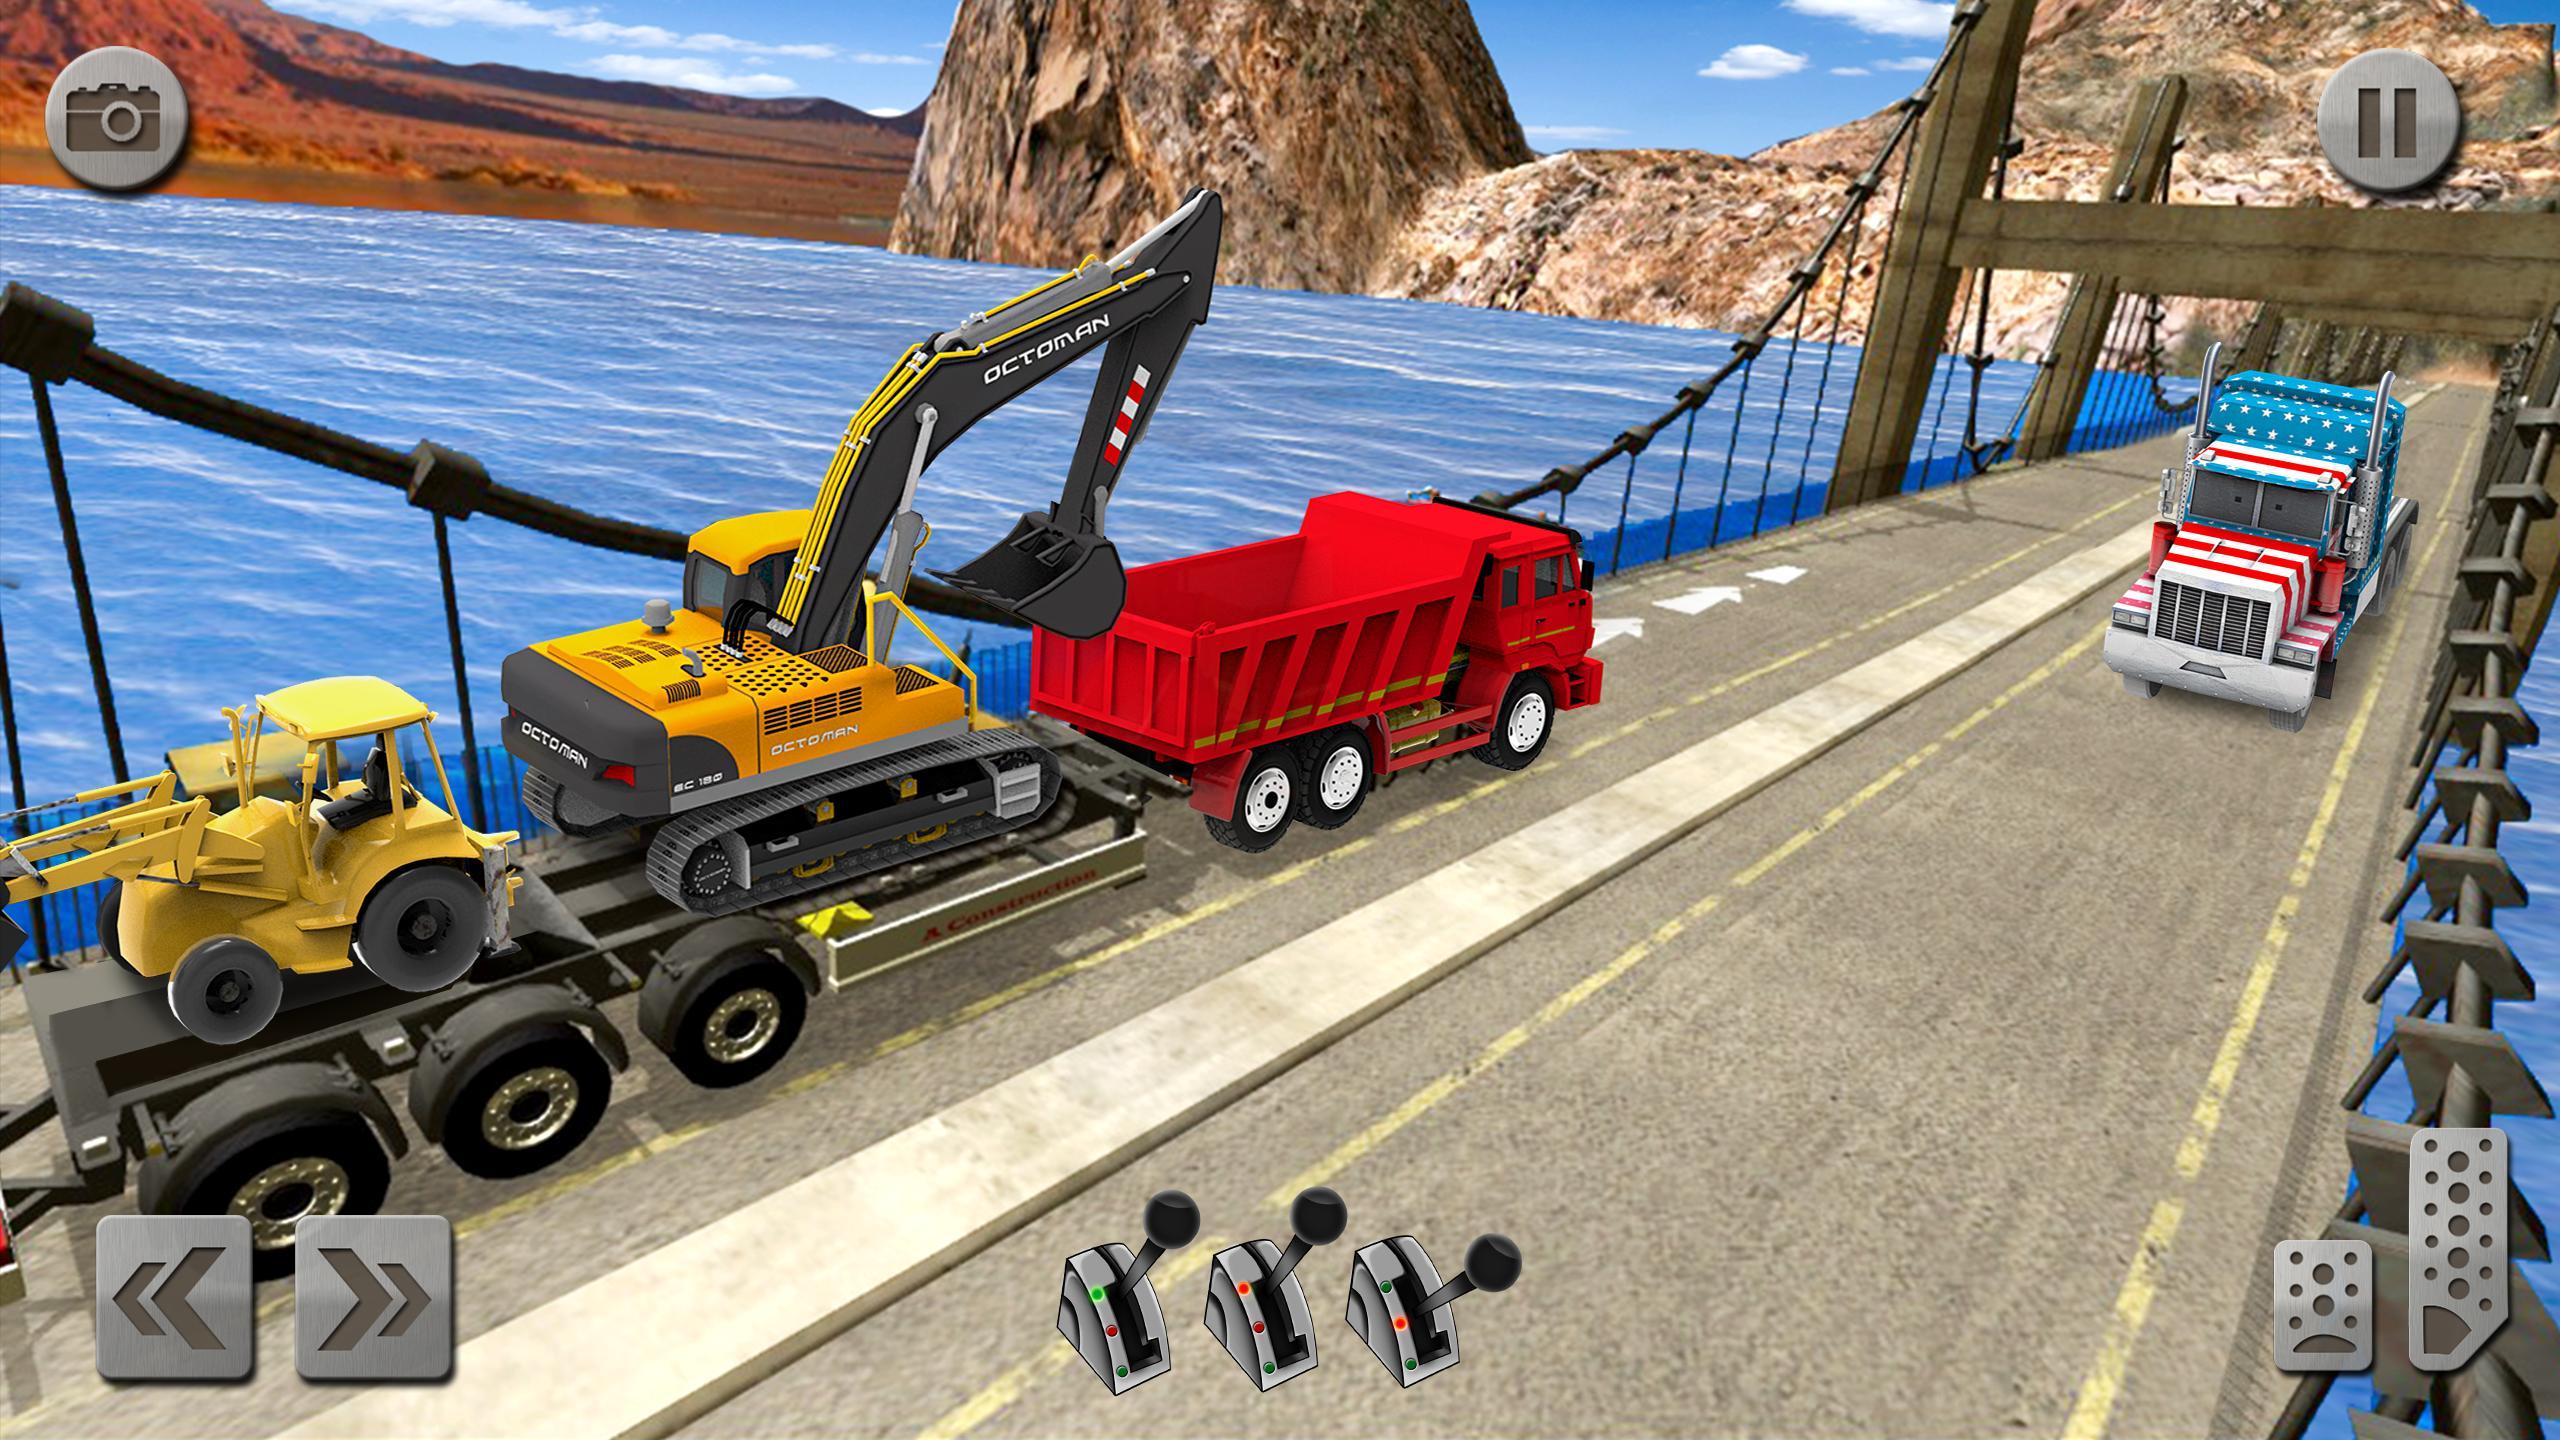 Sand Excavator Truck Driving Rescue Simulator game 5.2 Screenshot 18